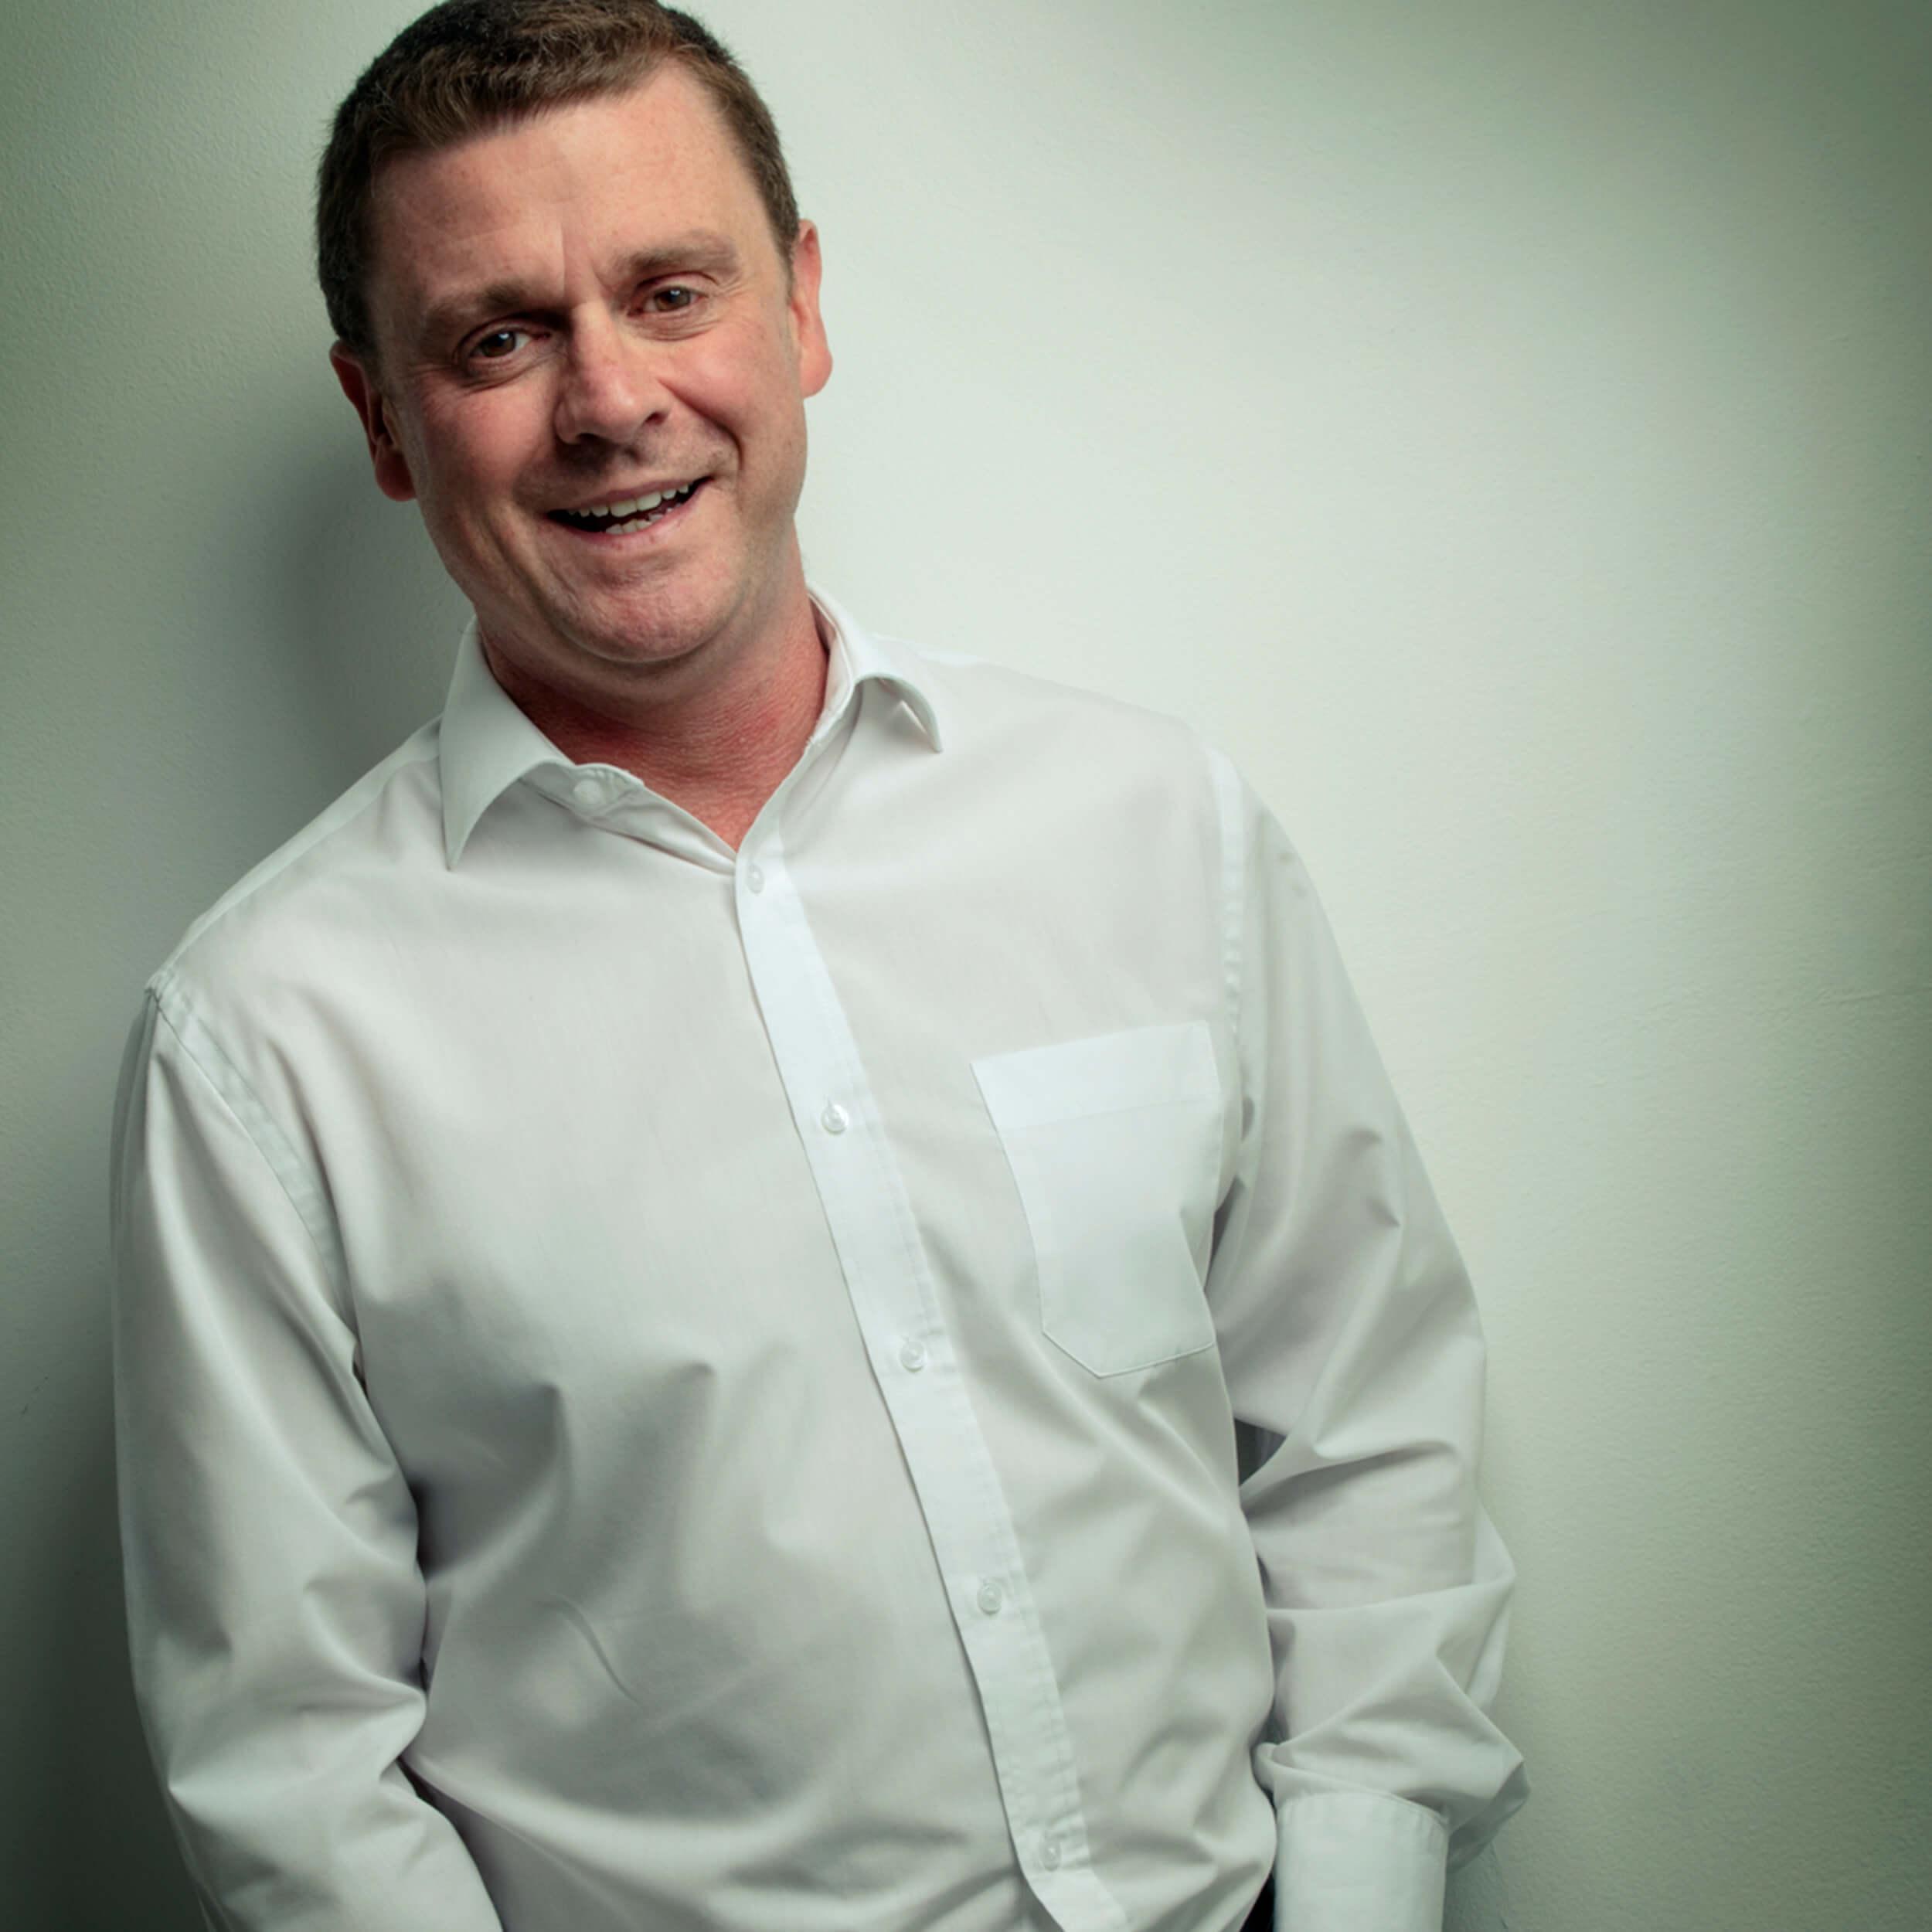 Paul Smith Associate Director IN Accountancy